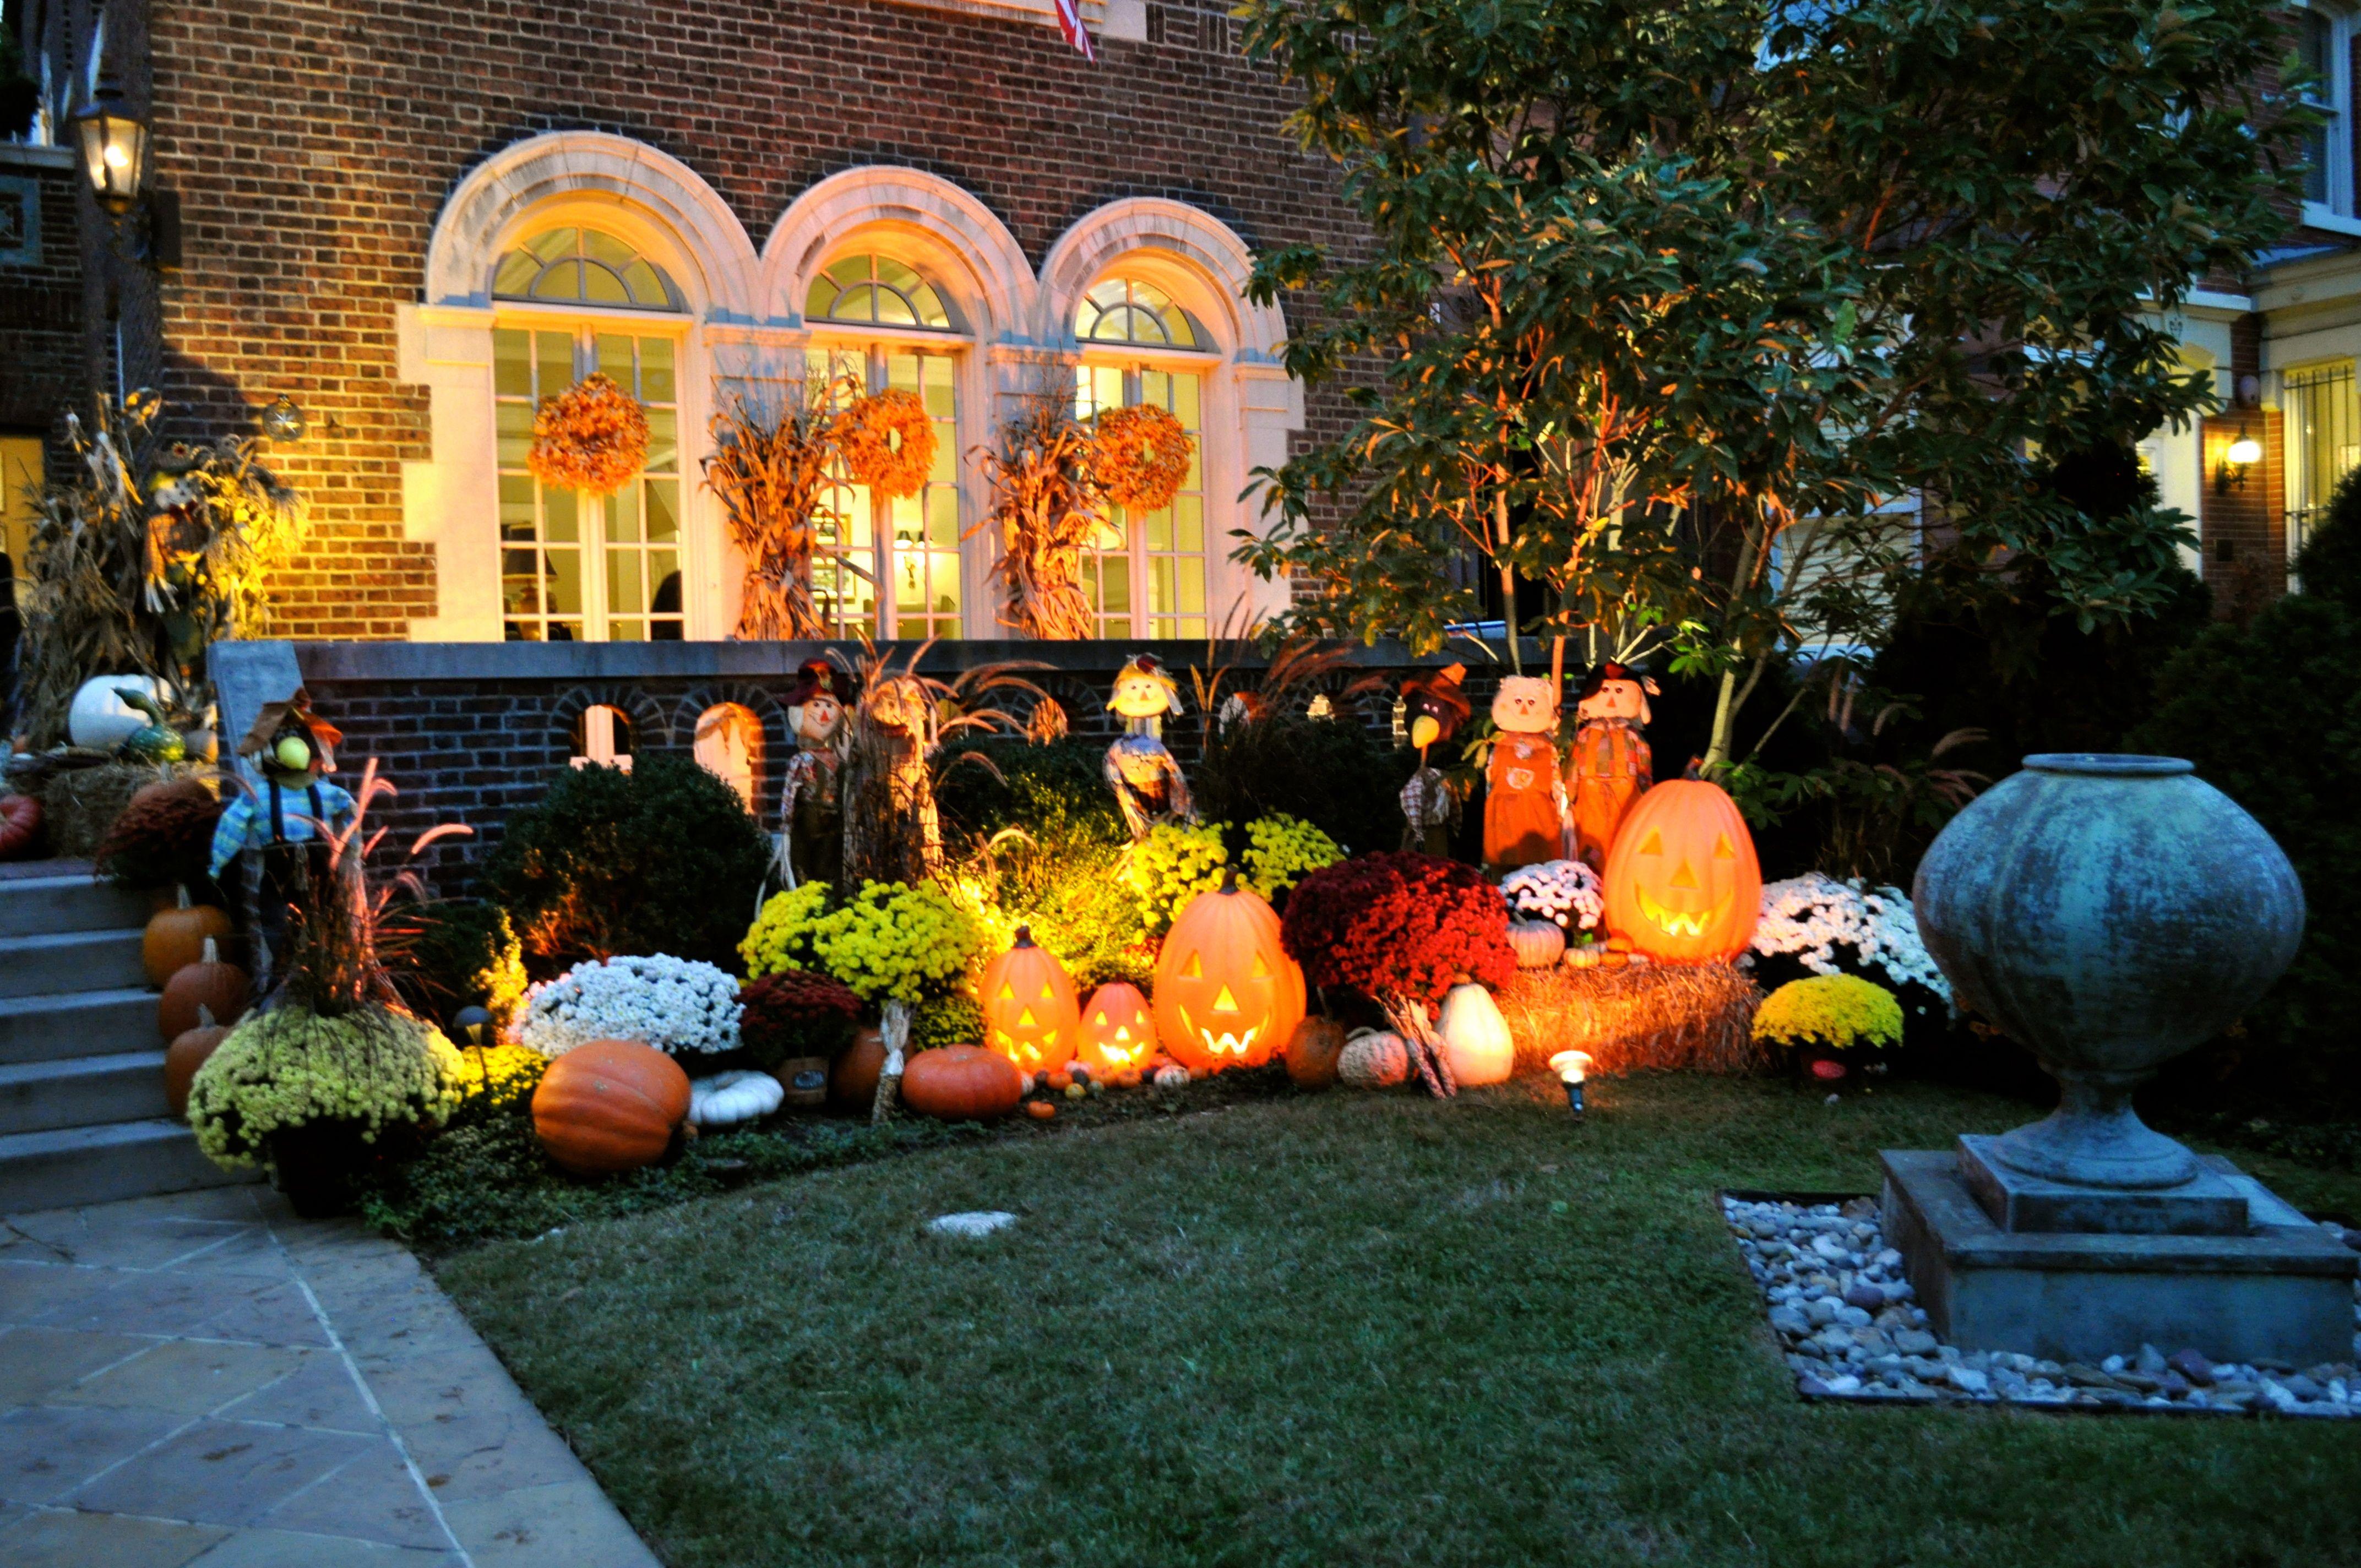 backyard and style garden design decor outdoor ideas decoration zen best splendid idea with stunning gallery alluring